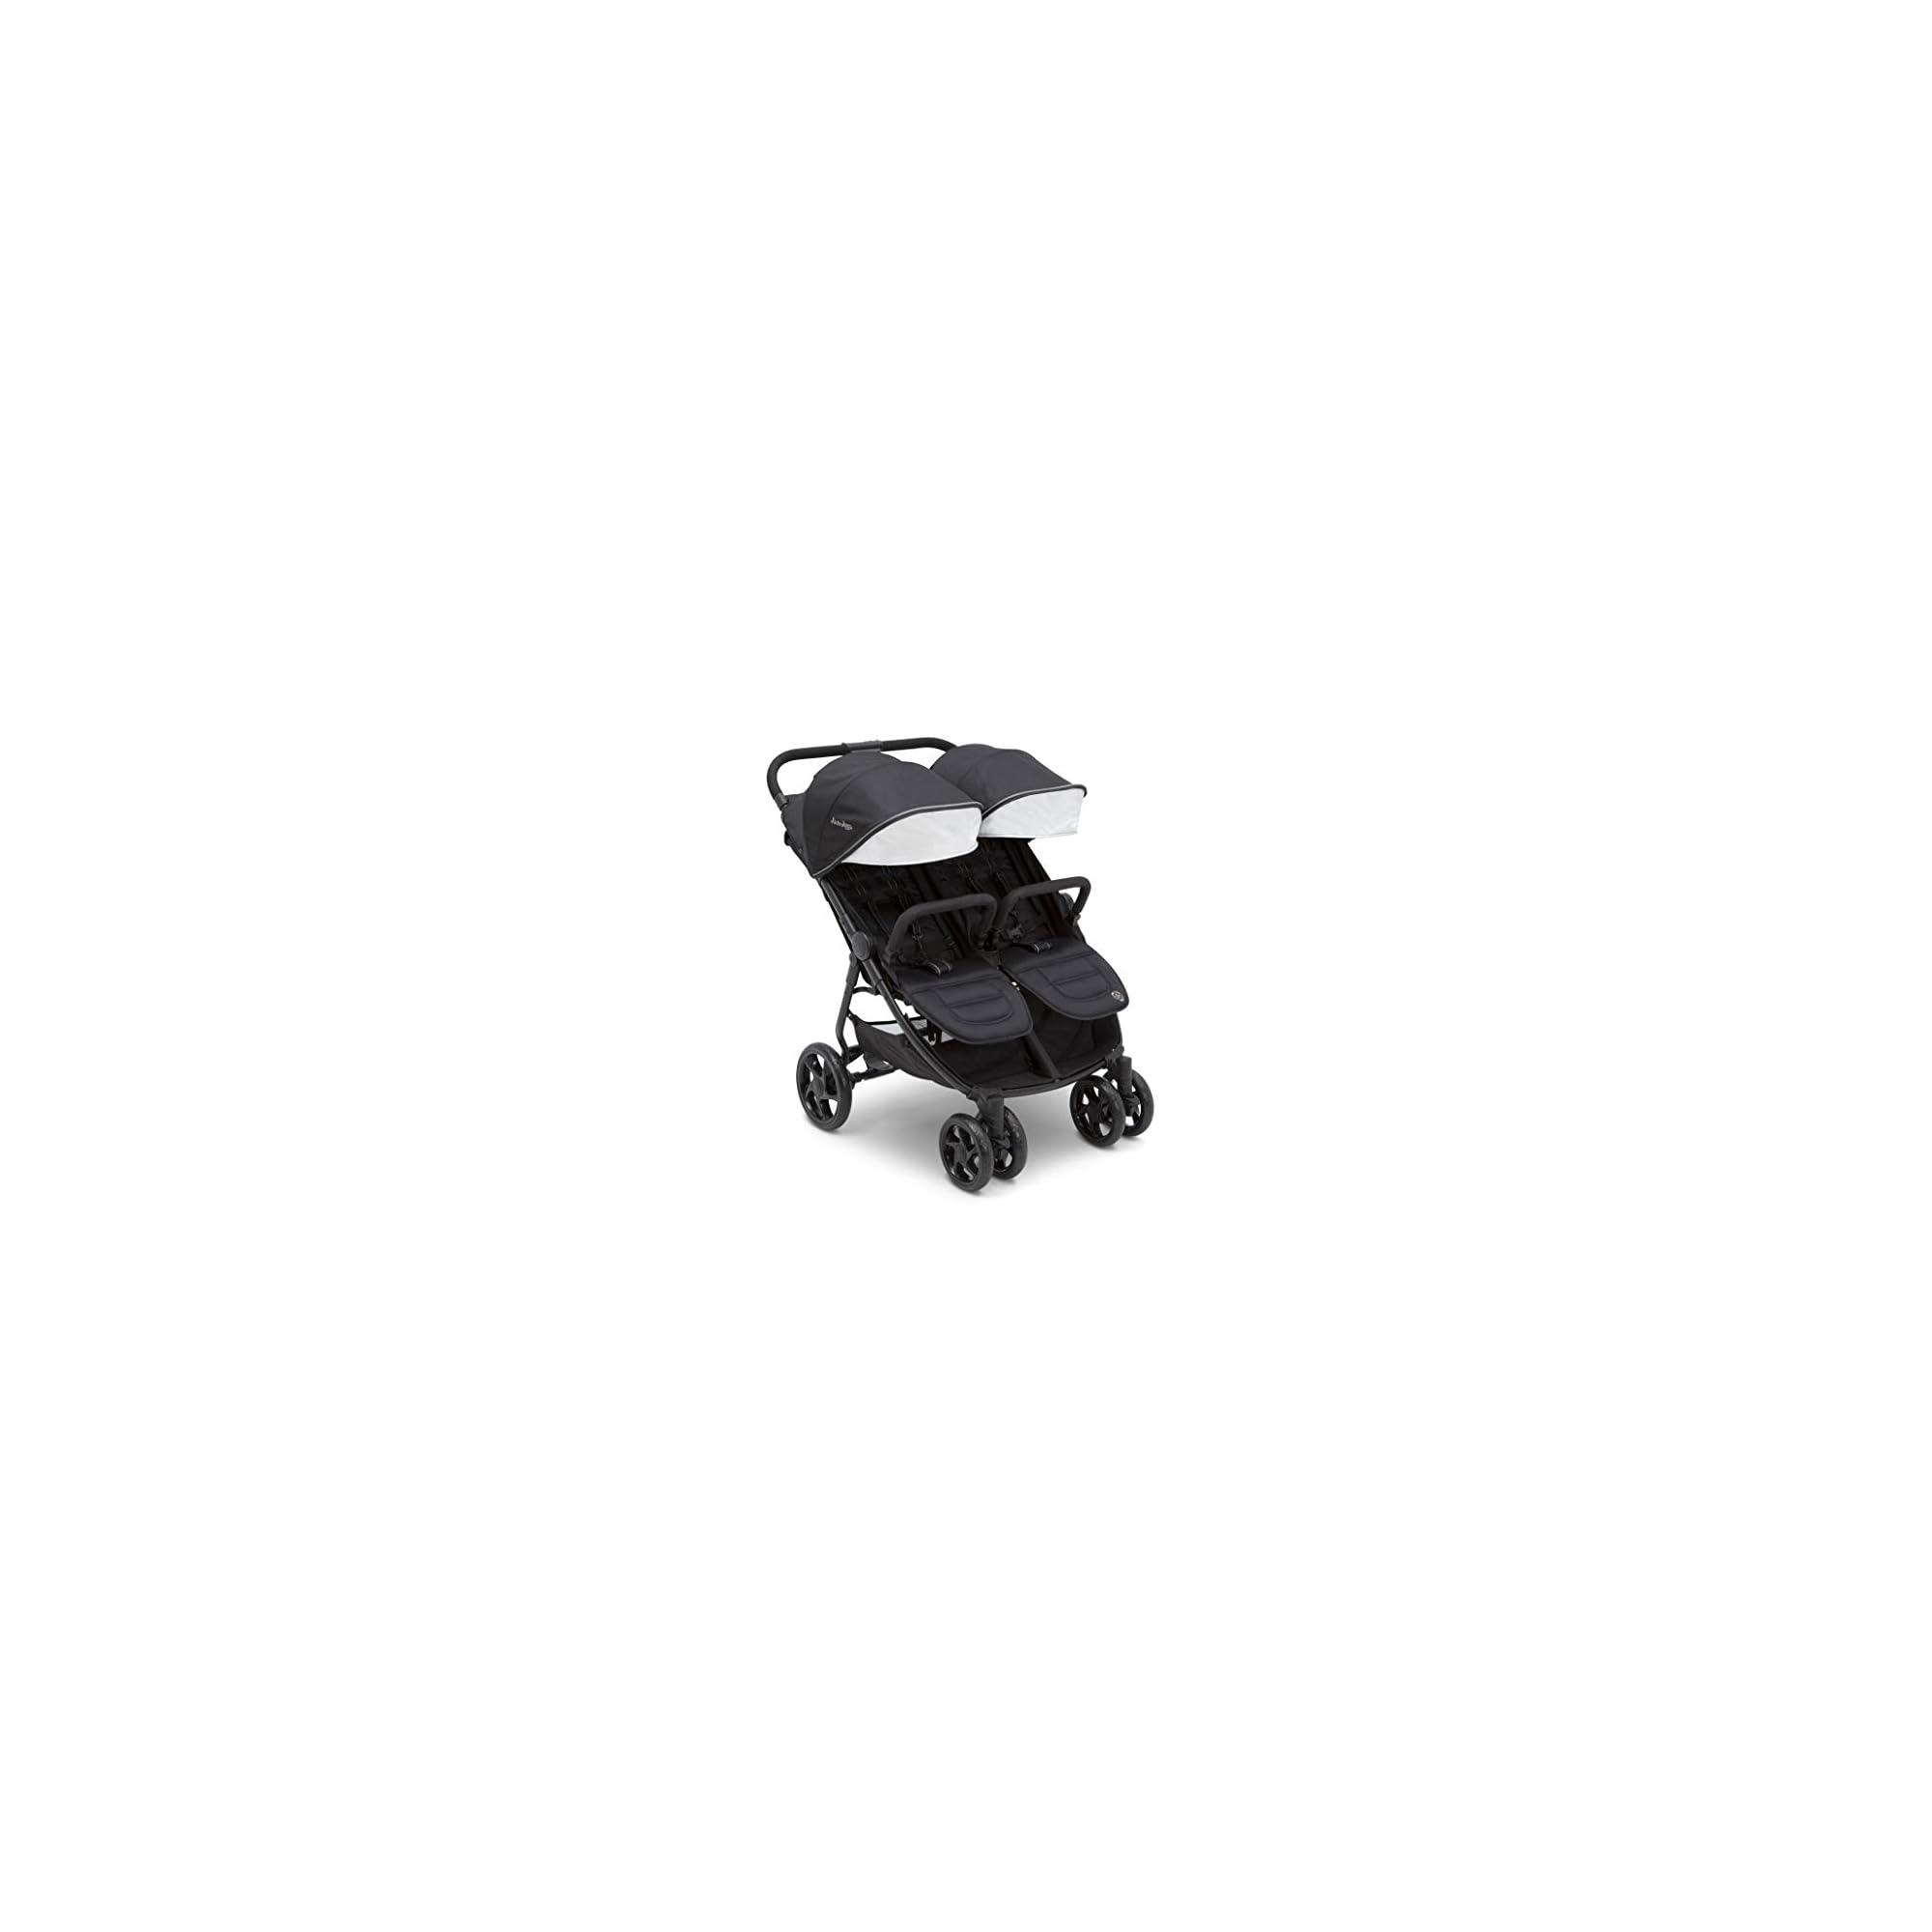 Jeep Destination Ultralight Side x Side Double Stroller, Midnight (Black)